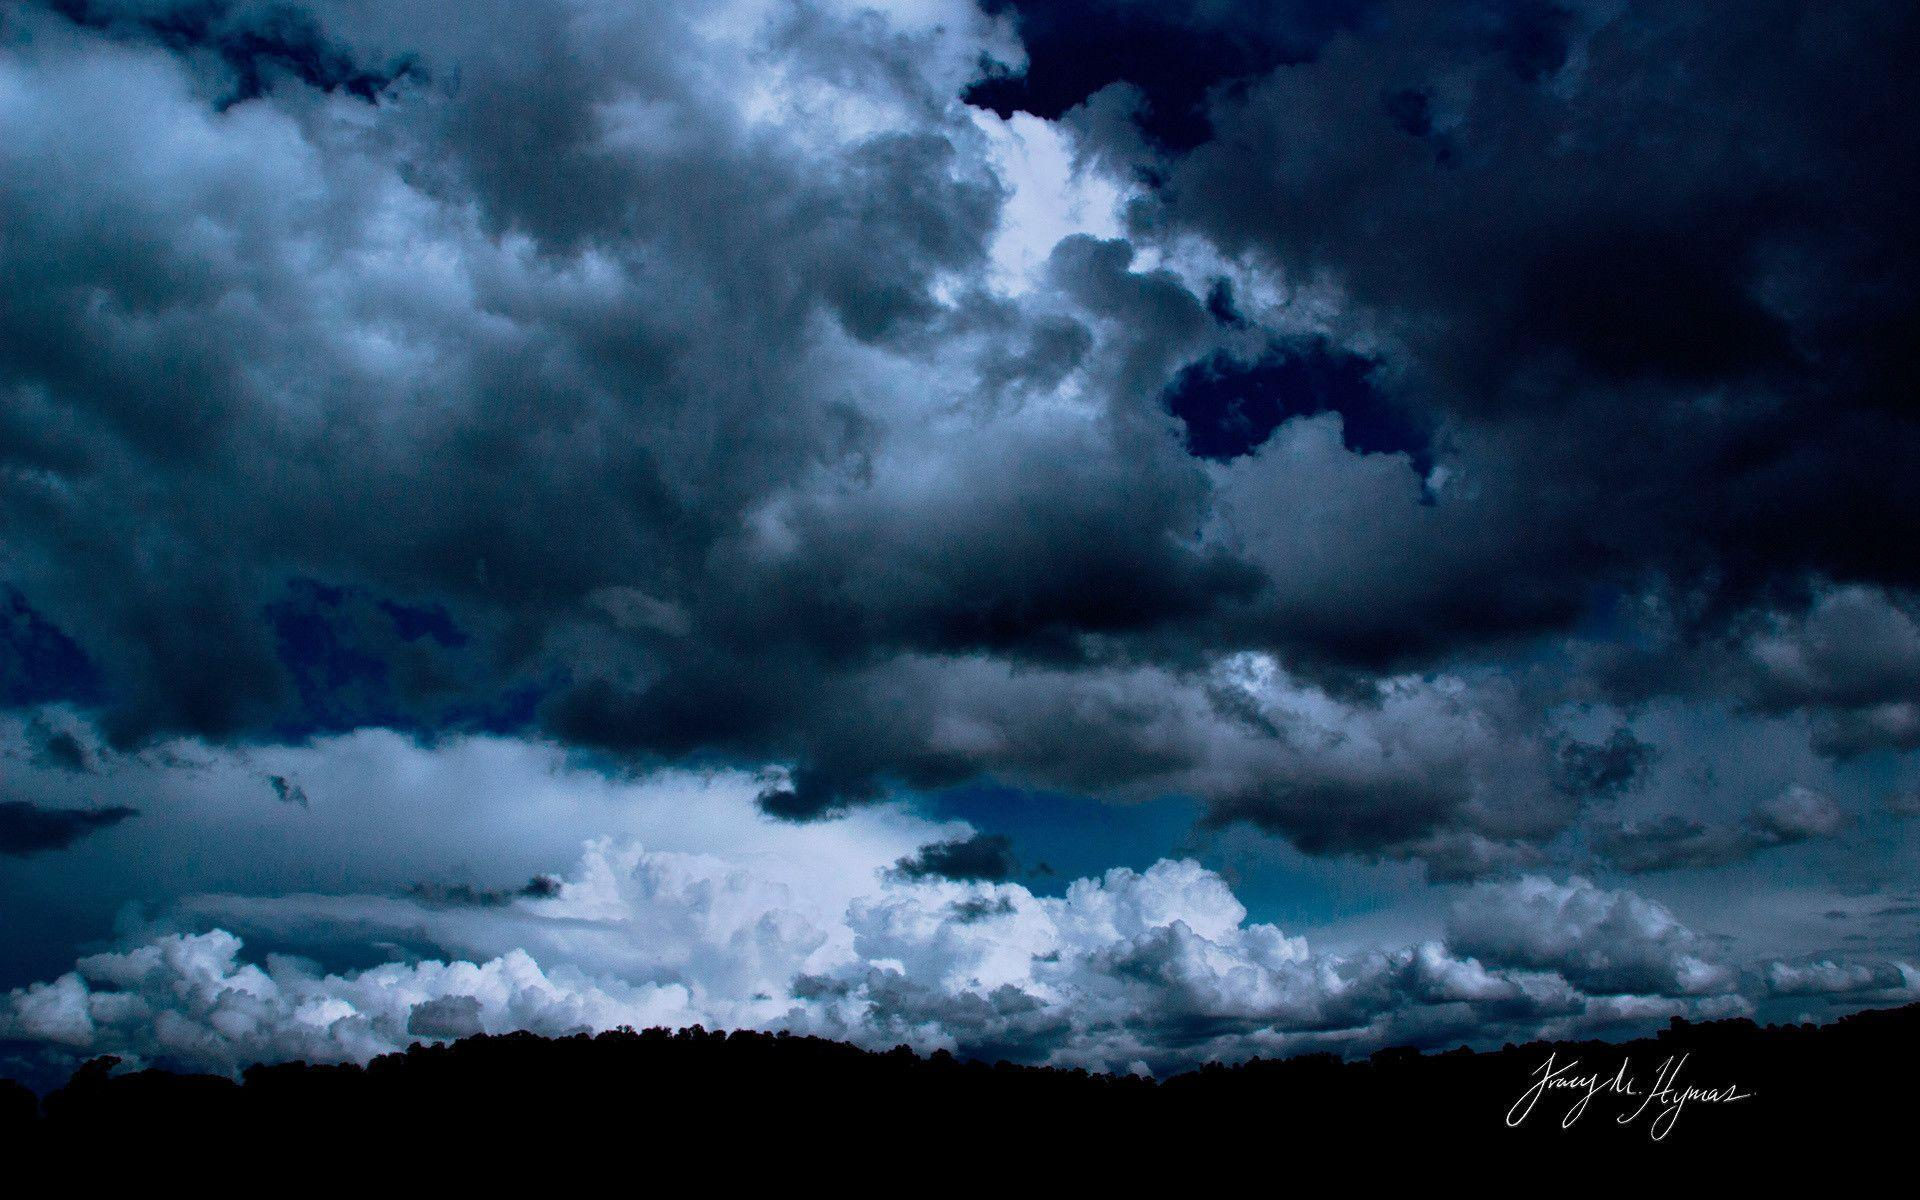 Dark Blue Sky Wallpapers Top Free Dark Blue Sky Backgrounds Wallpaperaccess